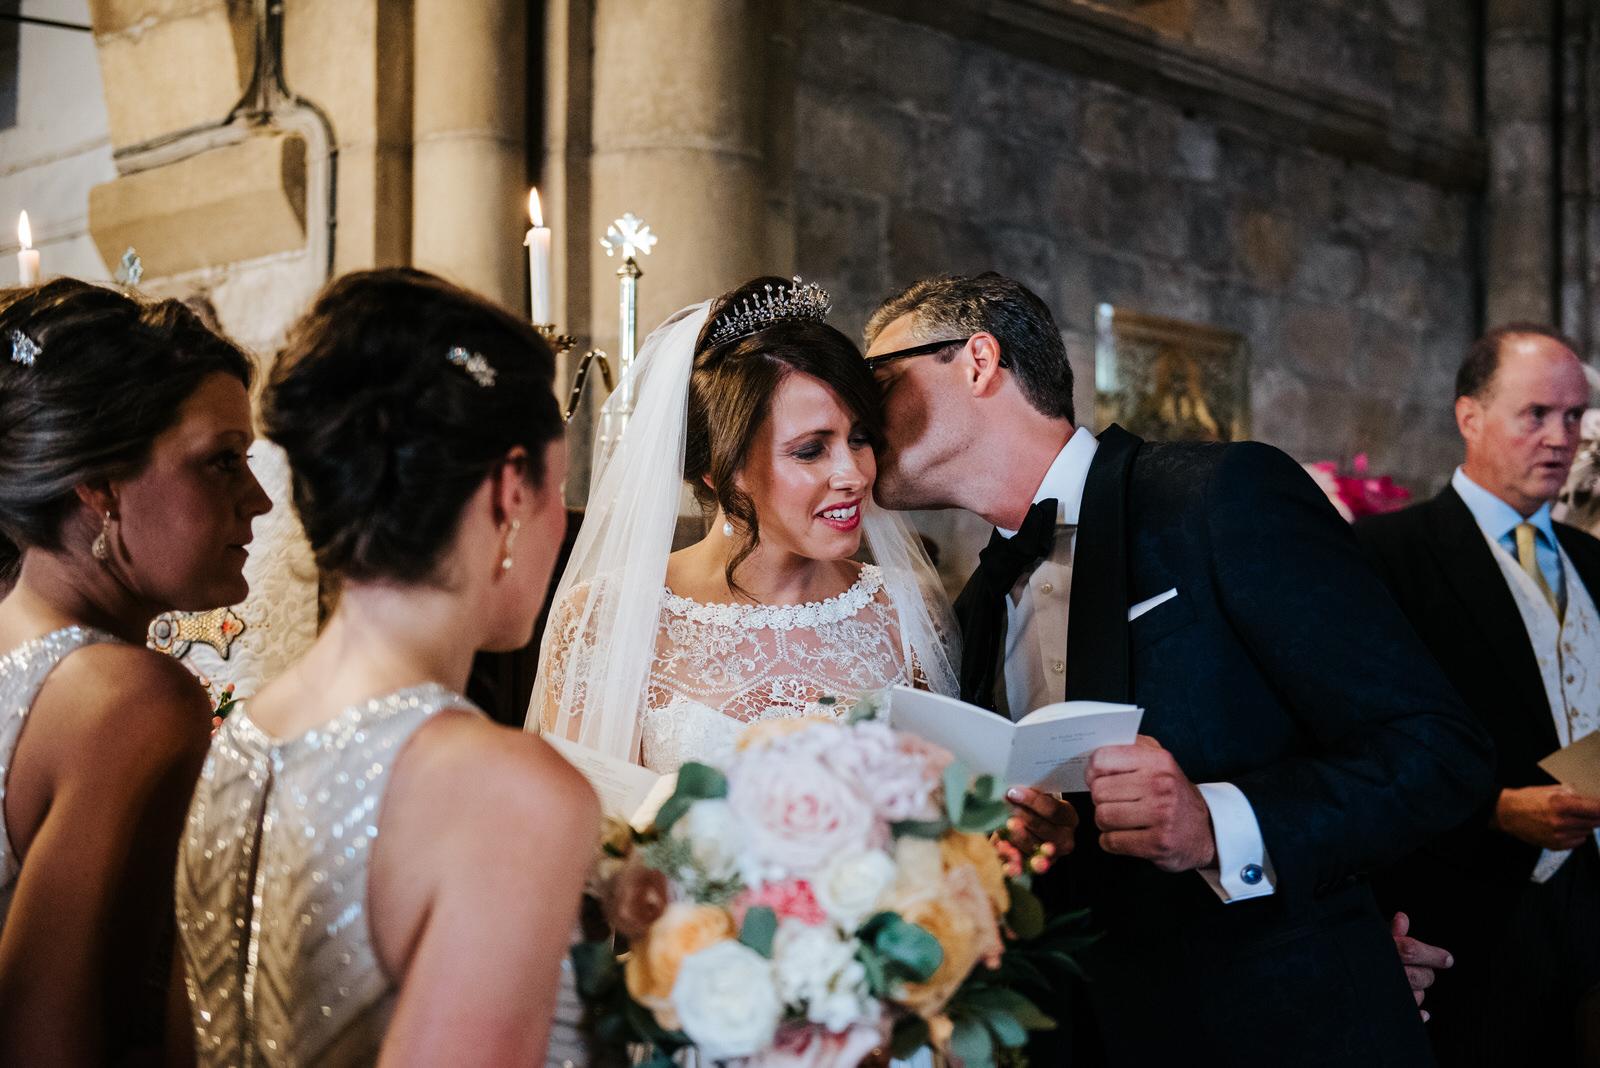 Groom kisses bride on the cheek inside church as readings take p